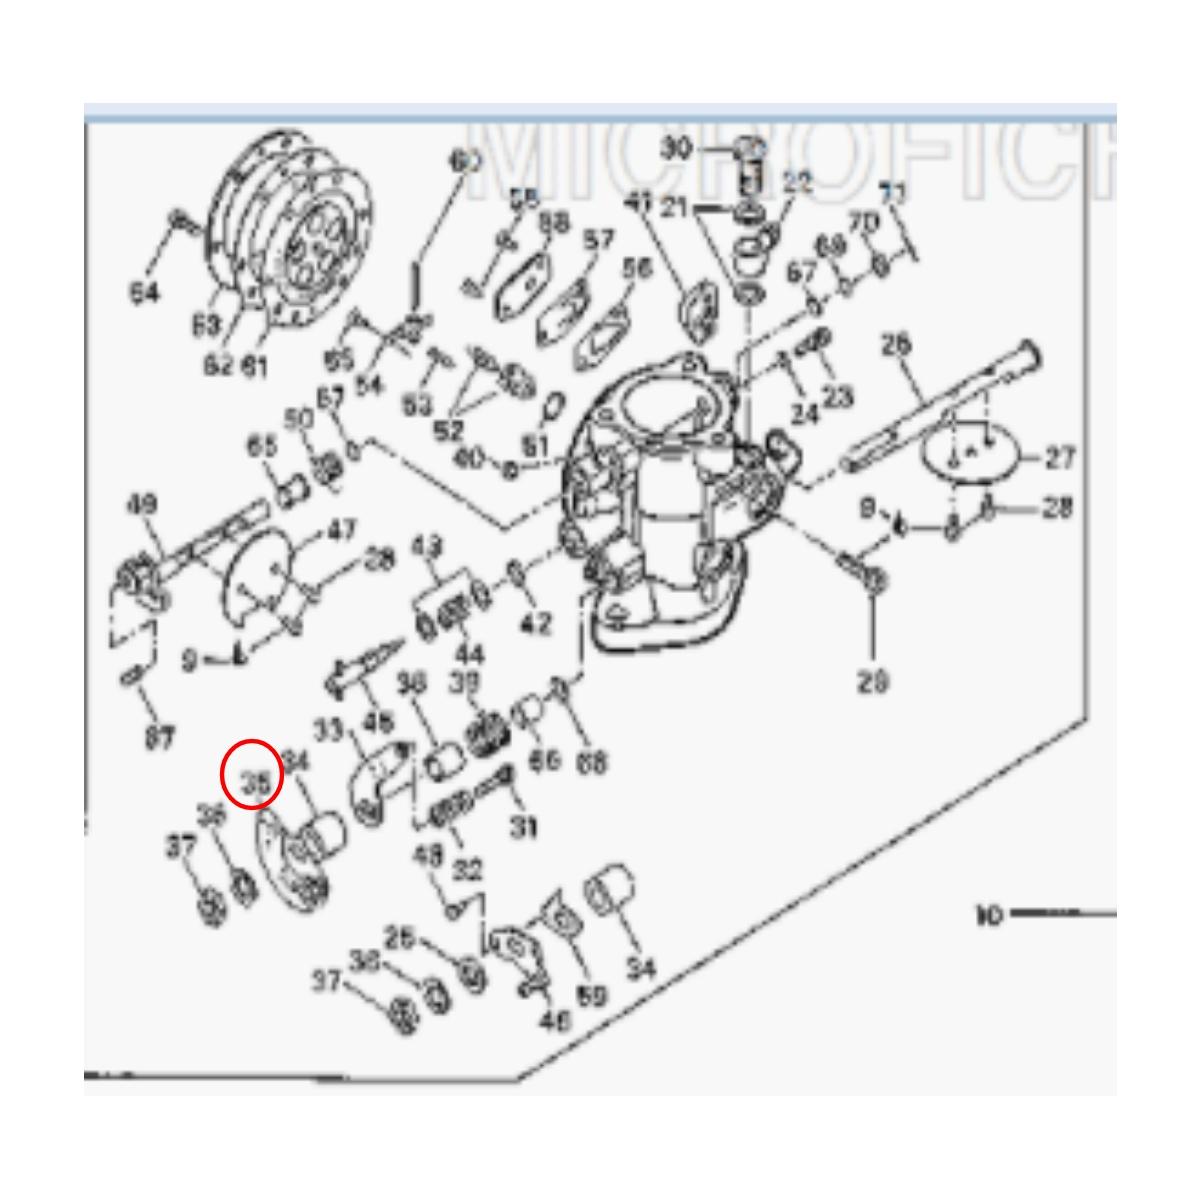 Alavanca Carburador para Jet Ski Sea Doo GT 90  - Radical Peças - Peças para Jet Ski